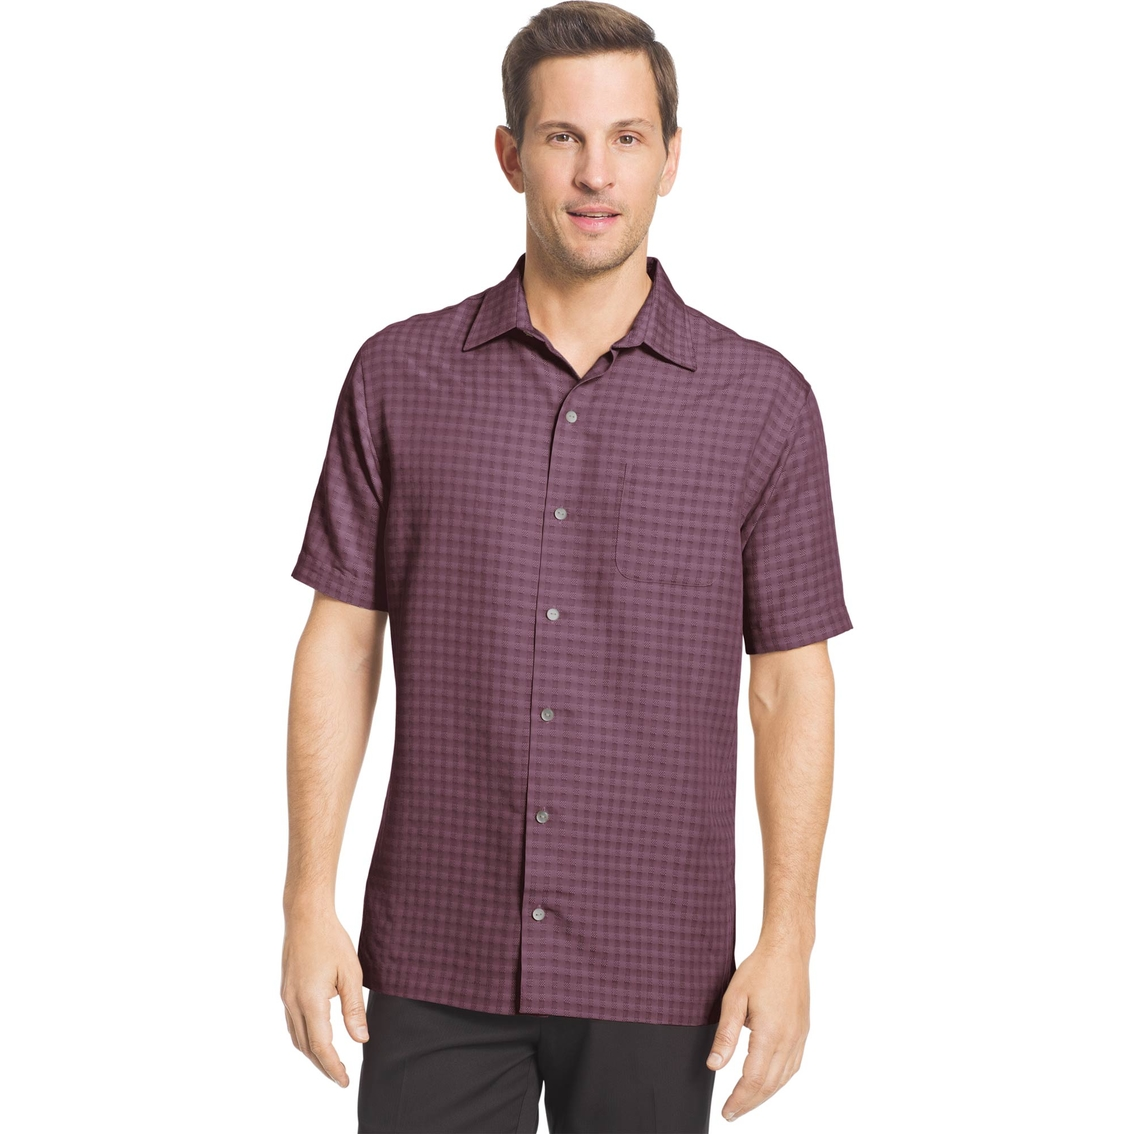 Van Heusen Air Grid Shirt Casual Apparel Shop The Exchange